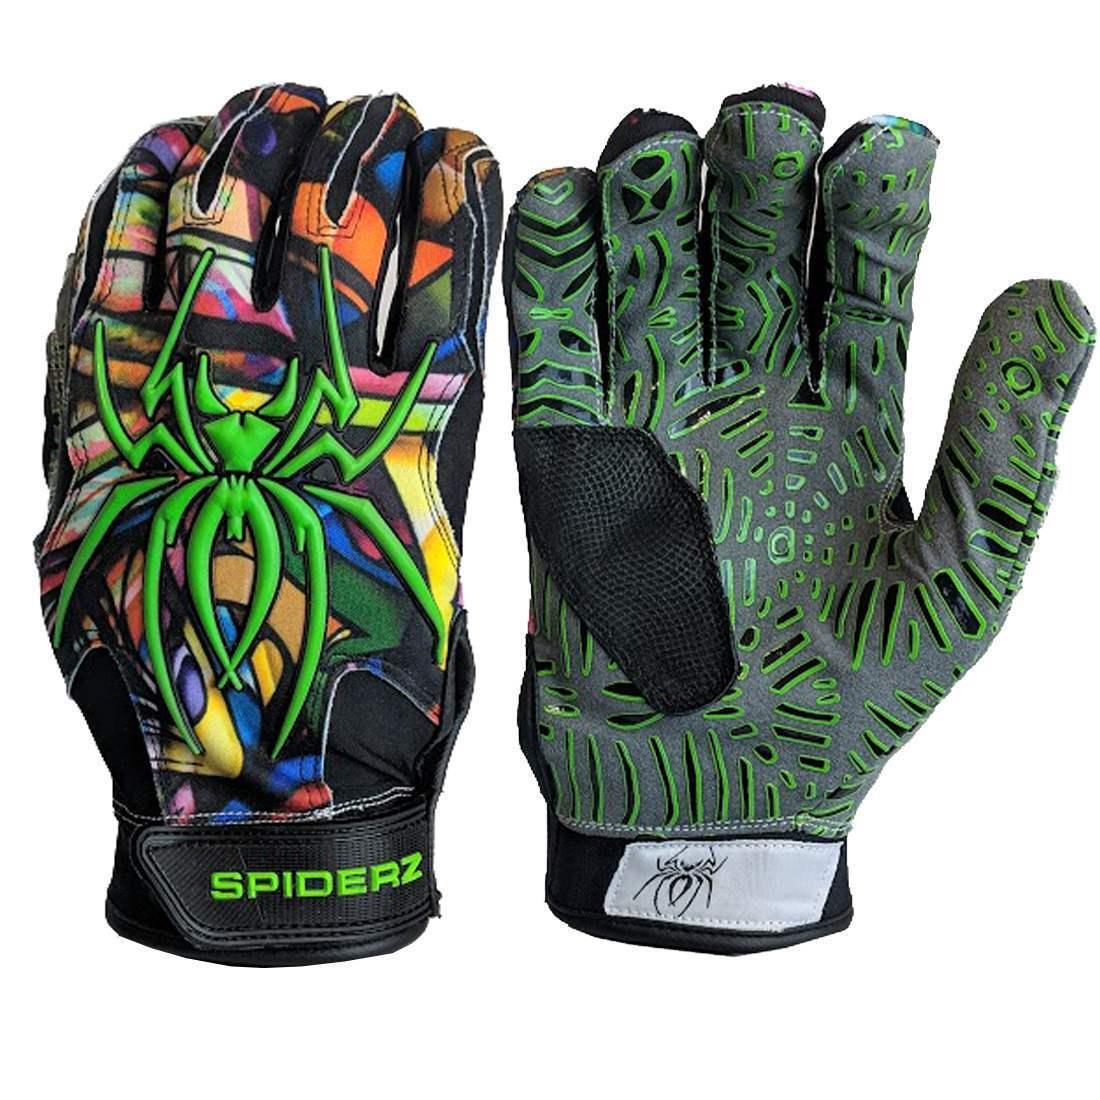 Web Tac Palm Spiderz HYBRID Batting Gloves Gloves Batting Graffiti MEDIUM d49b47